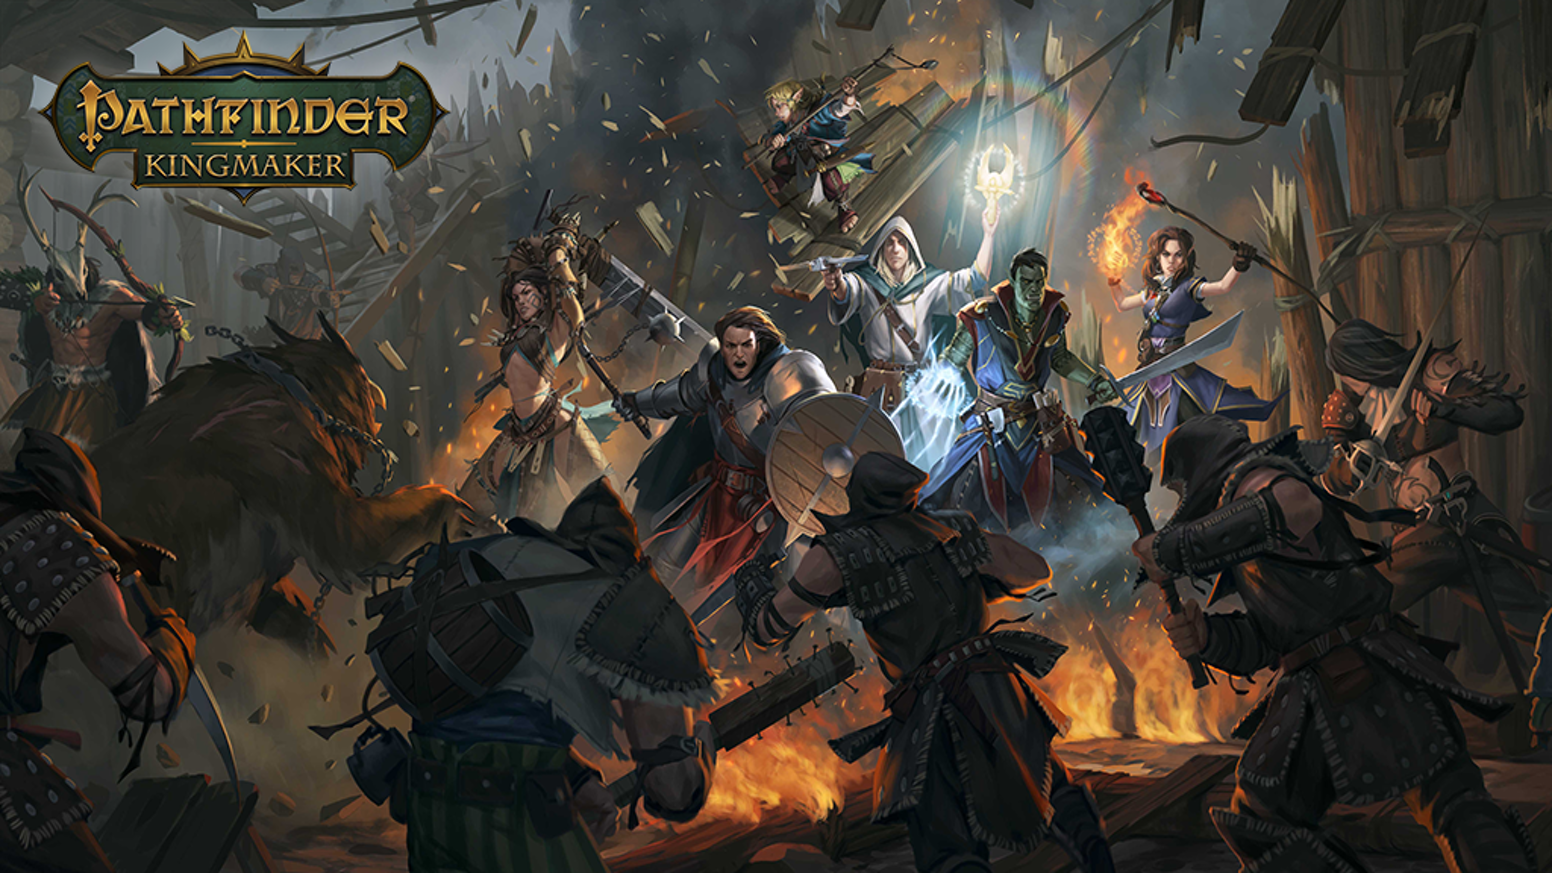 Pathfinder Kingmaker by Owlcat Games Kickstarter 1552x873